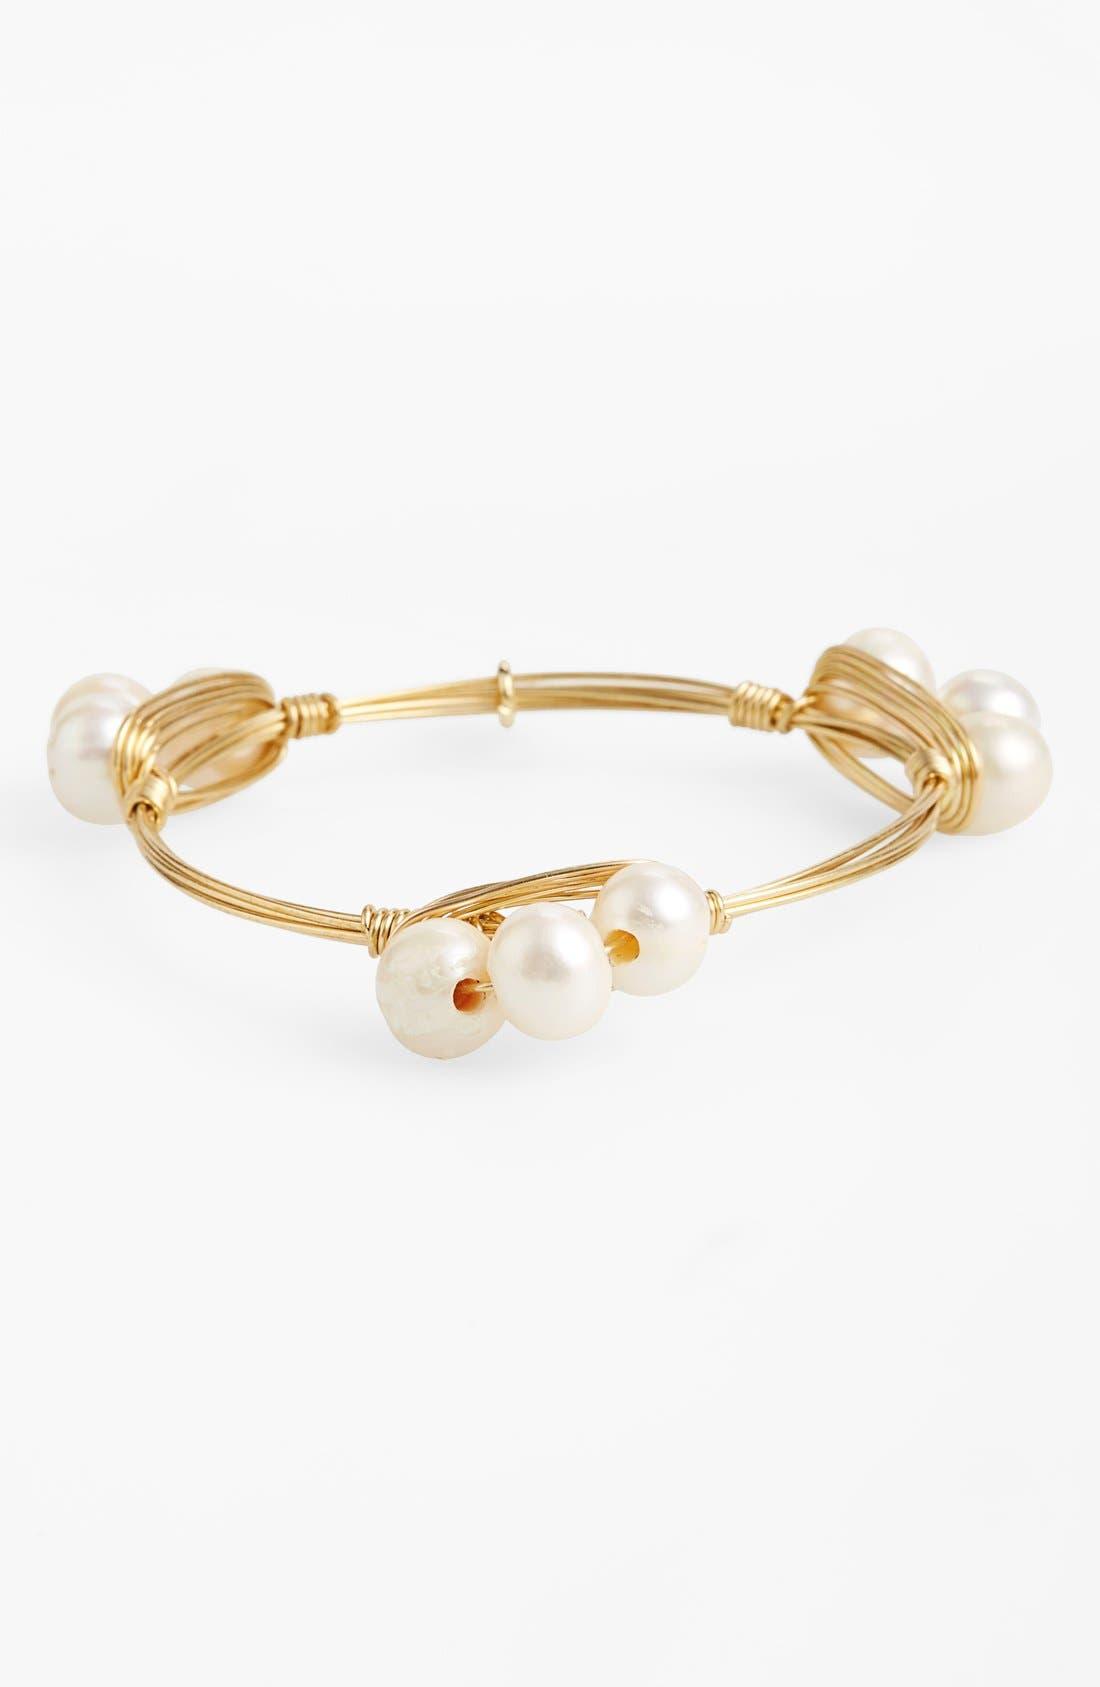 BOURBON AND BOWETIES Small Imitation Pearl Bracelet